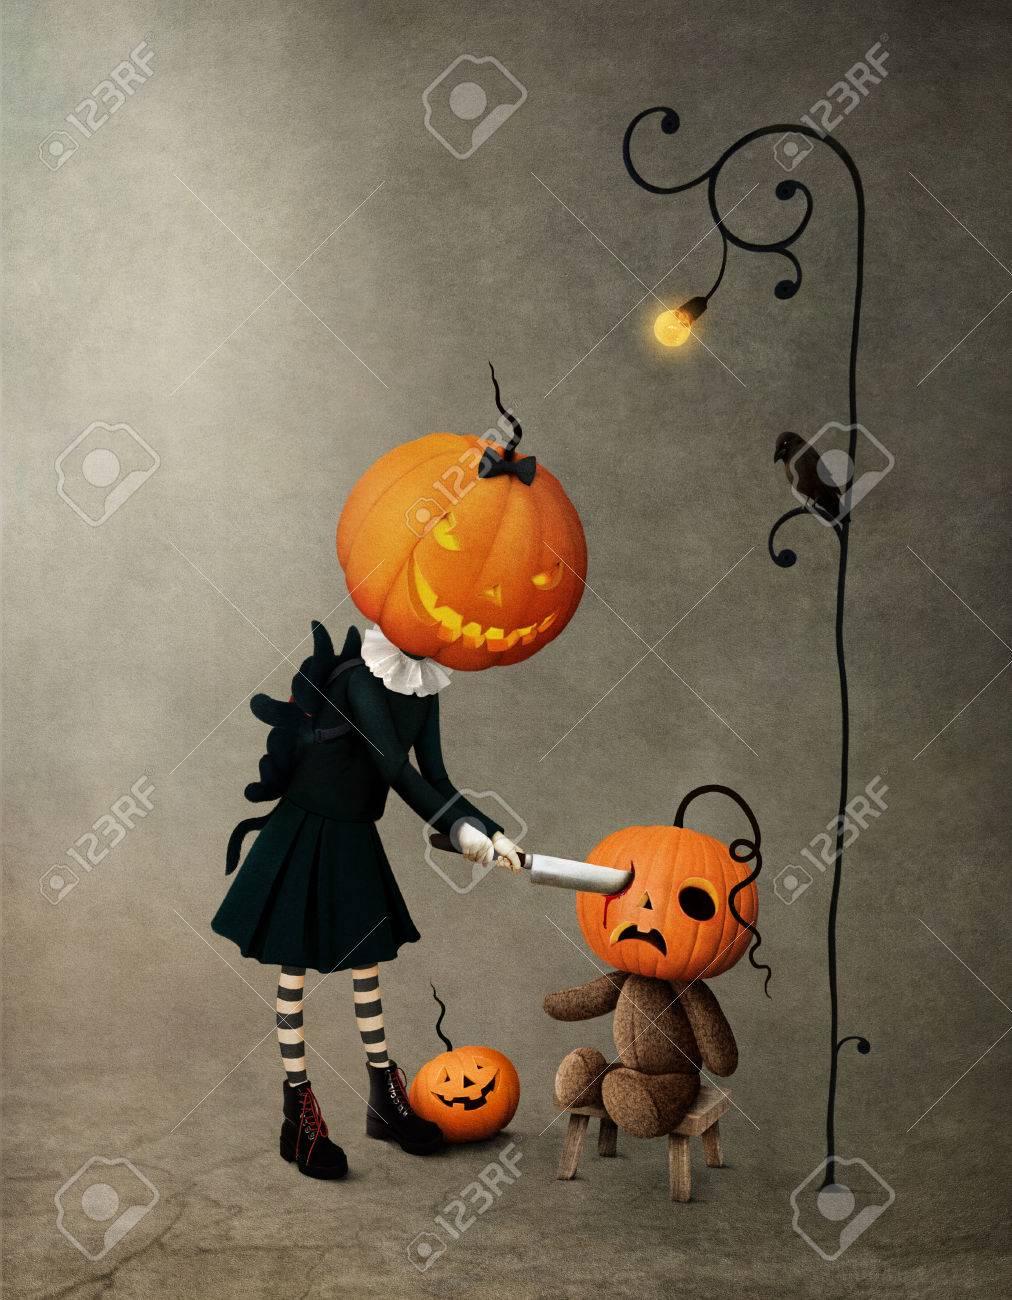 Conceptual illustration holidays greetings halloween with girl conceptual illustration holidays greetings halloween with girl pumpkin and bear stock illustration 83979036 m4hsunfo